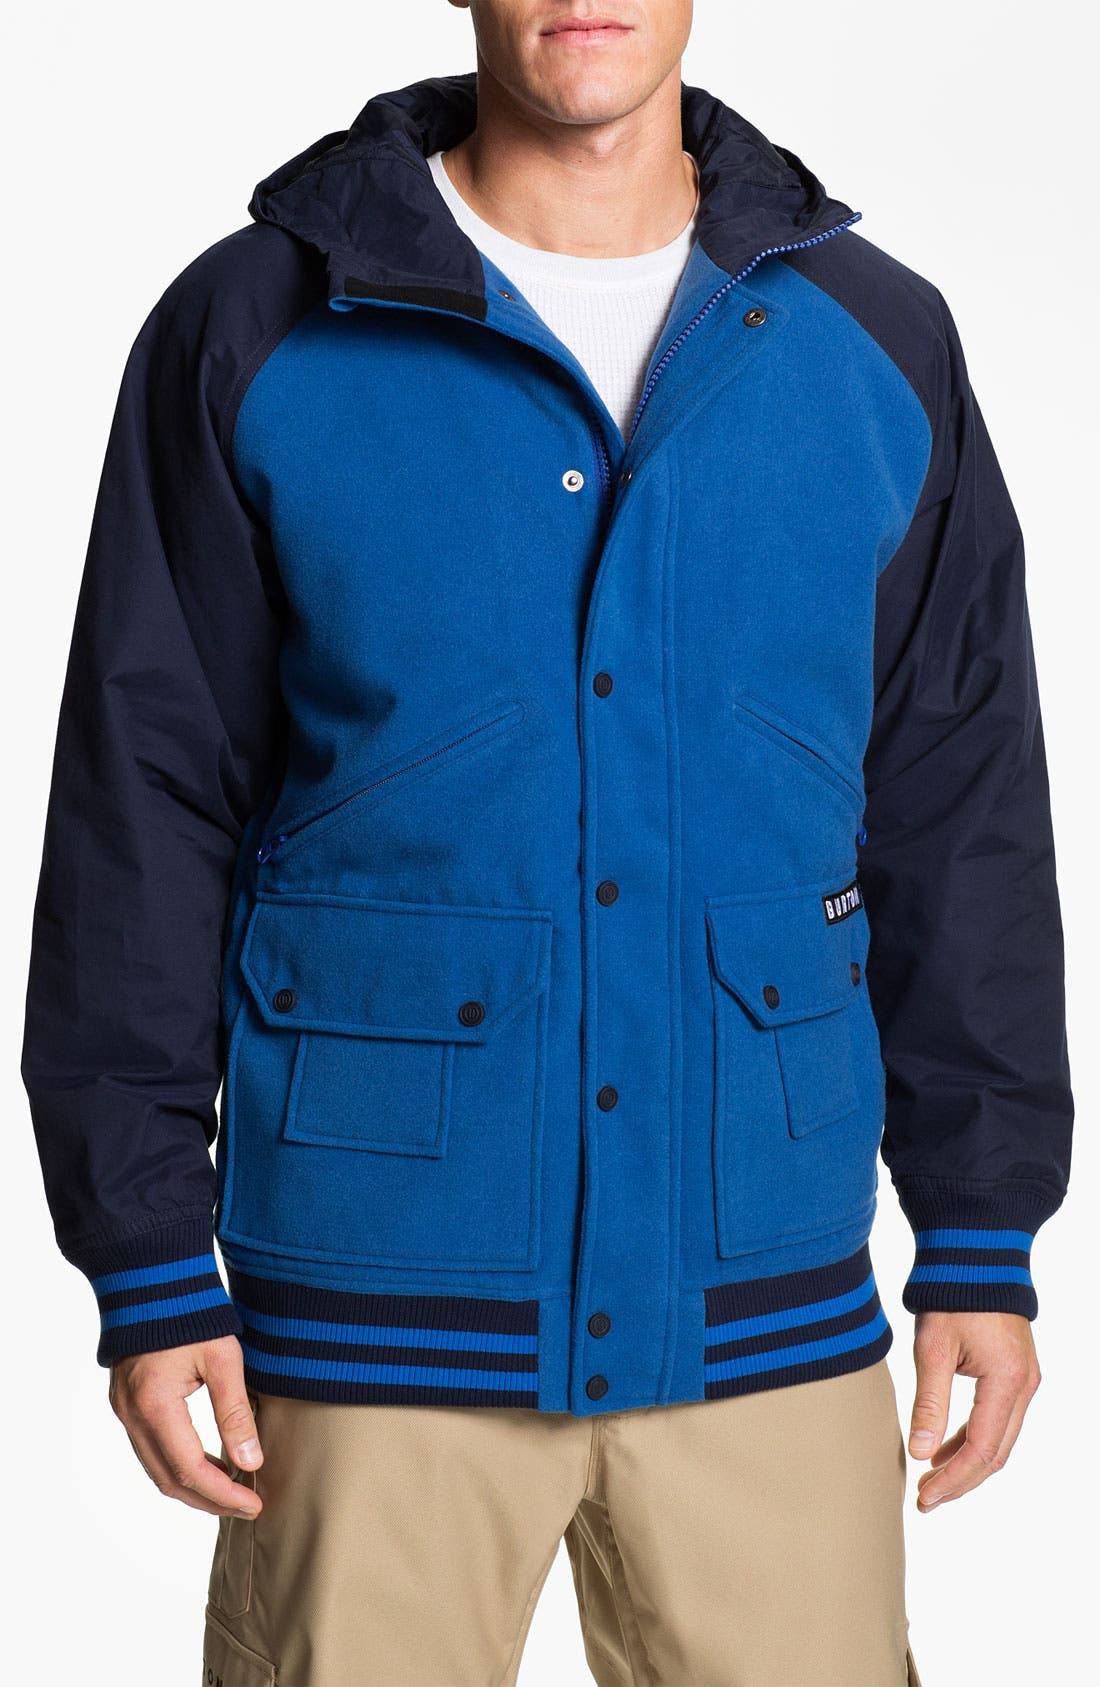 Alternate Image 1 Selected - Burton 'B-Side' Varsity Jacket